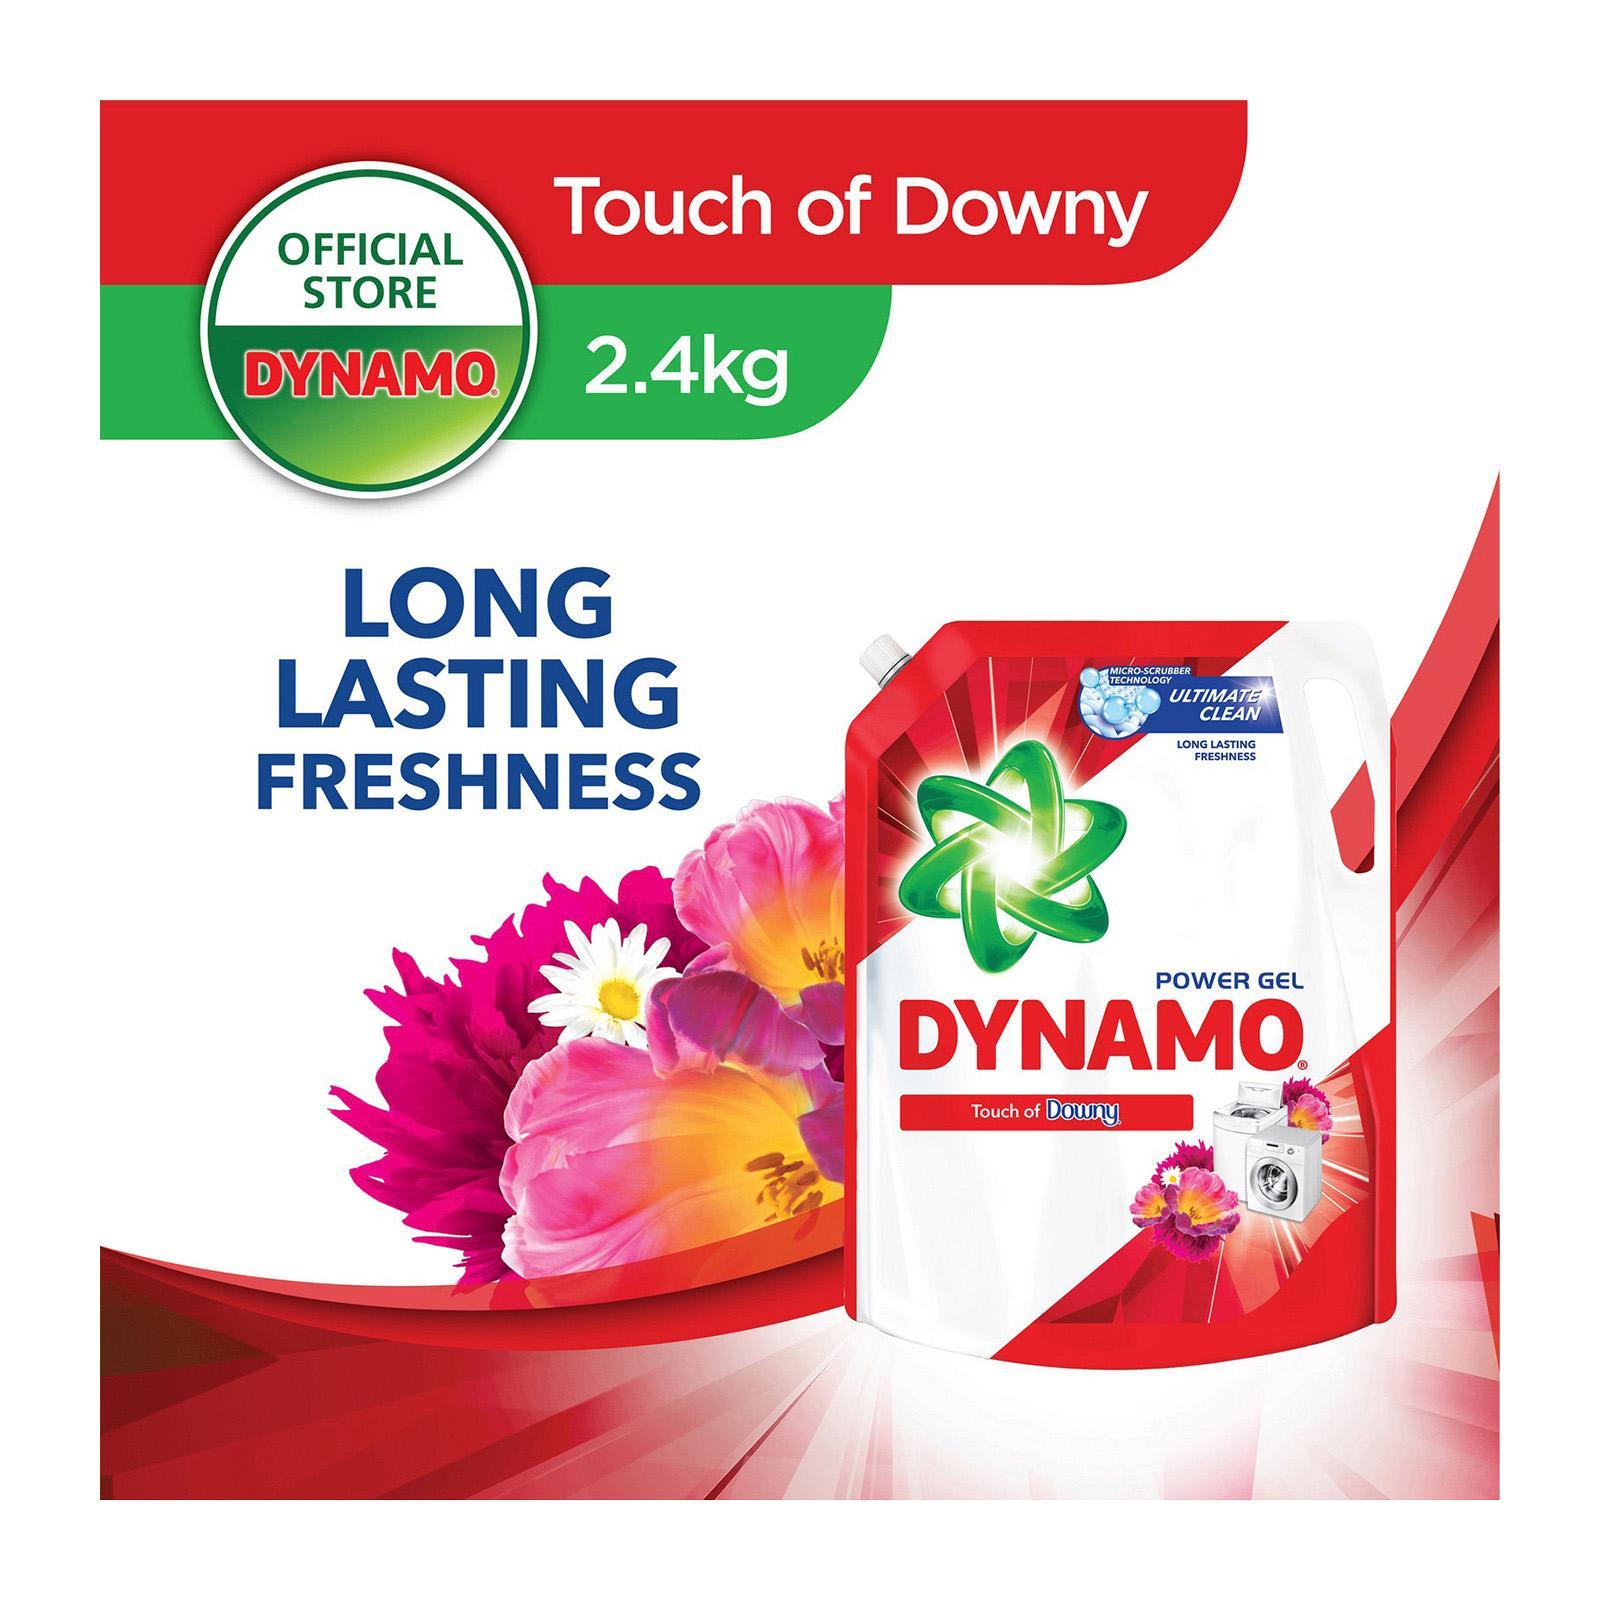 Dynamo Power Gel Freshness Of Downy Laundry Detergent Refill 2.4KG